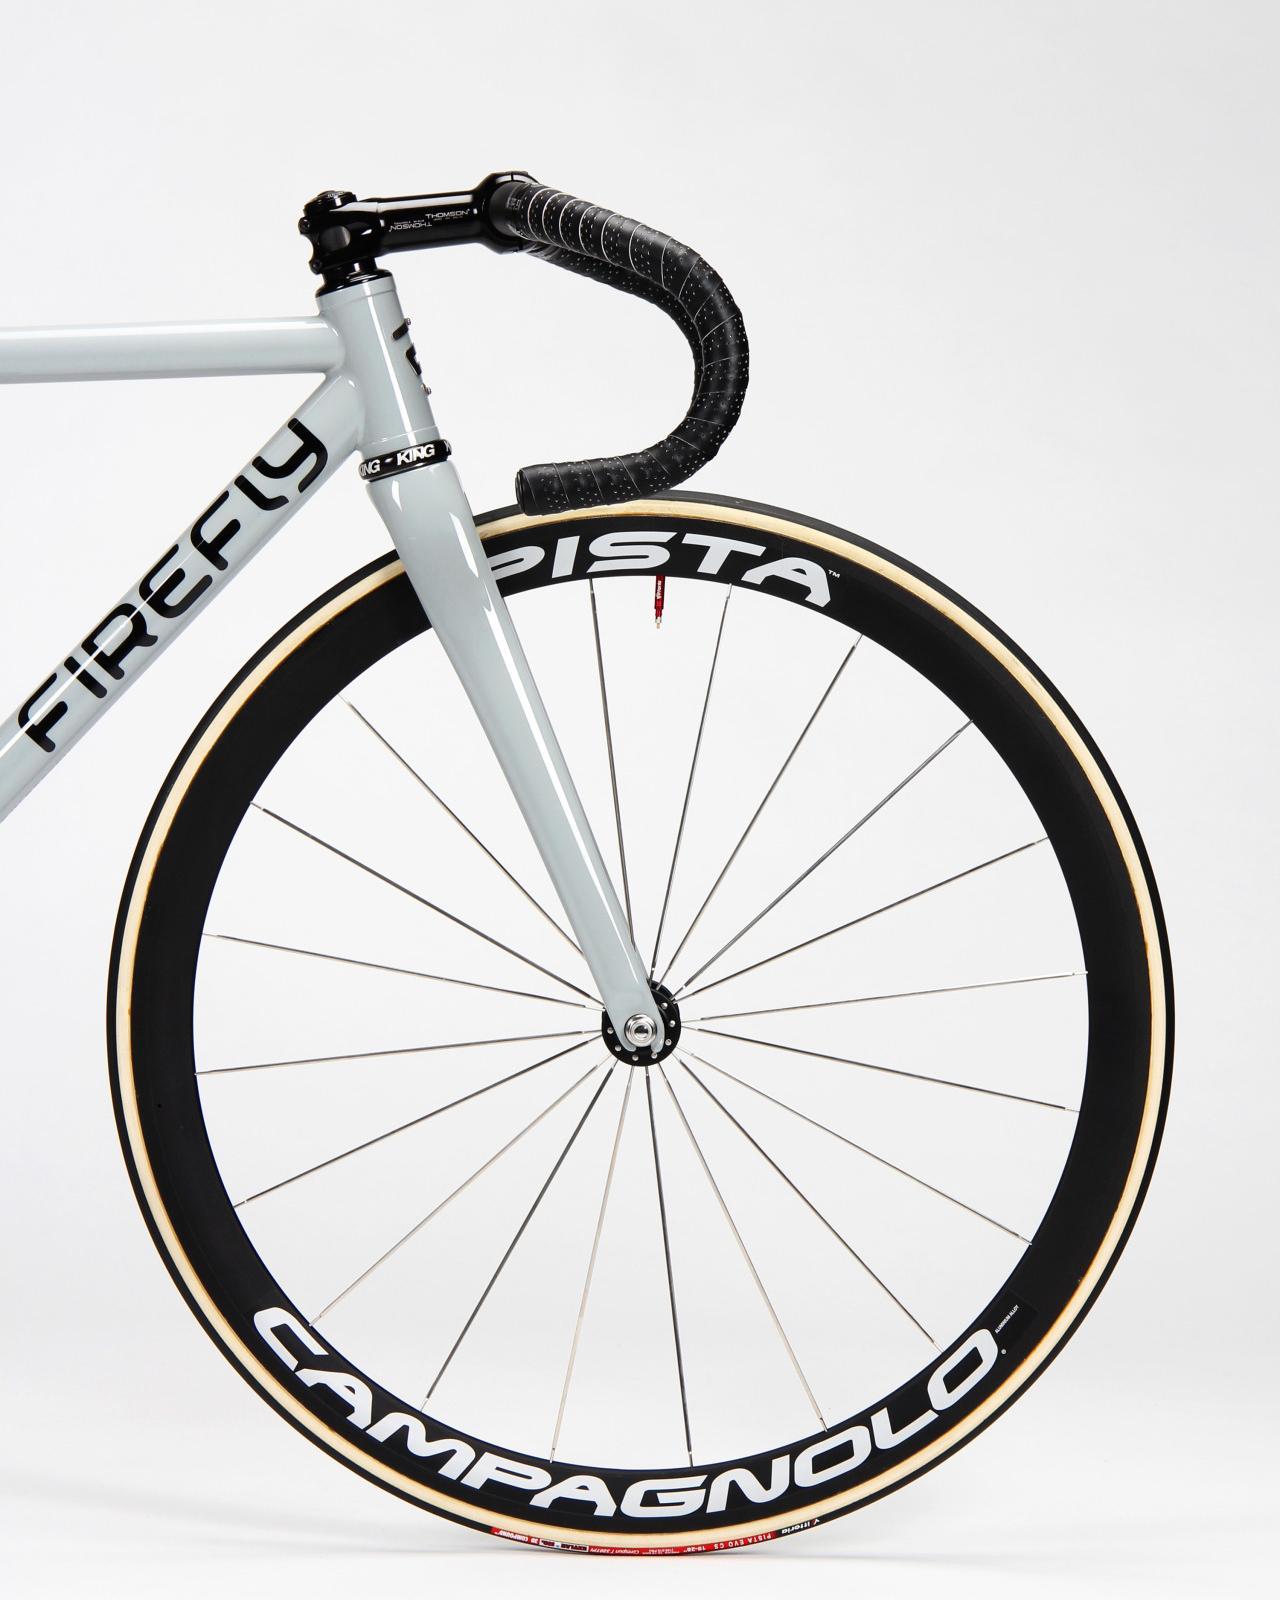 Firefly Bicycles: Titanium Track | The Radavist | A group of